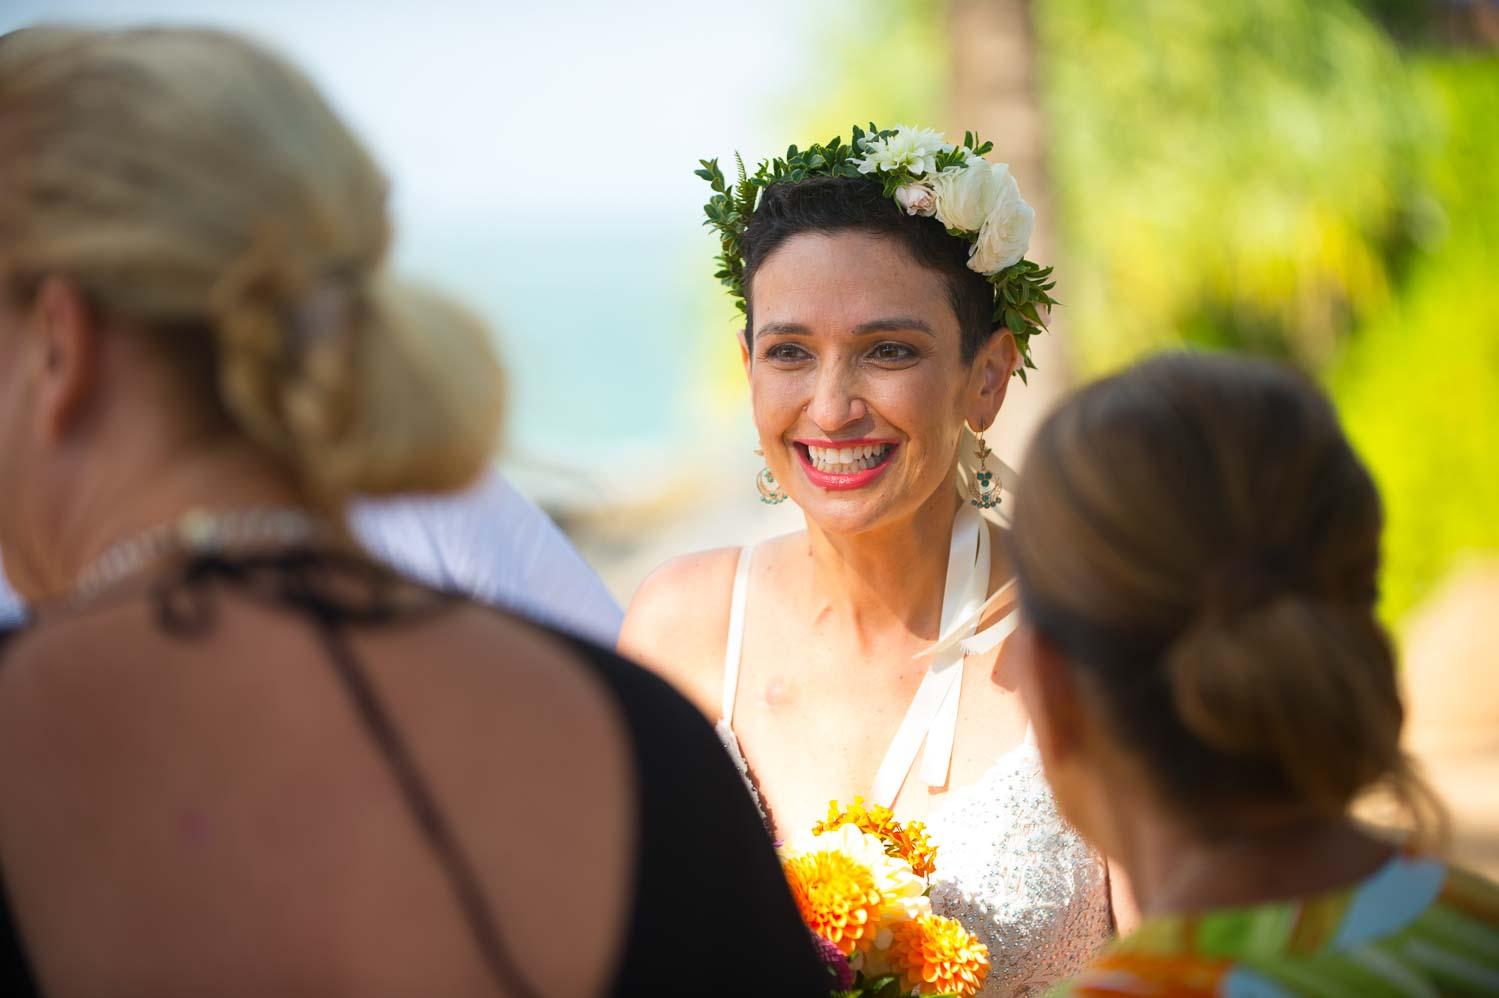 maui-wedding-photography-maui-wedding-venue-Tad-Craig-Photography-8.jpg